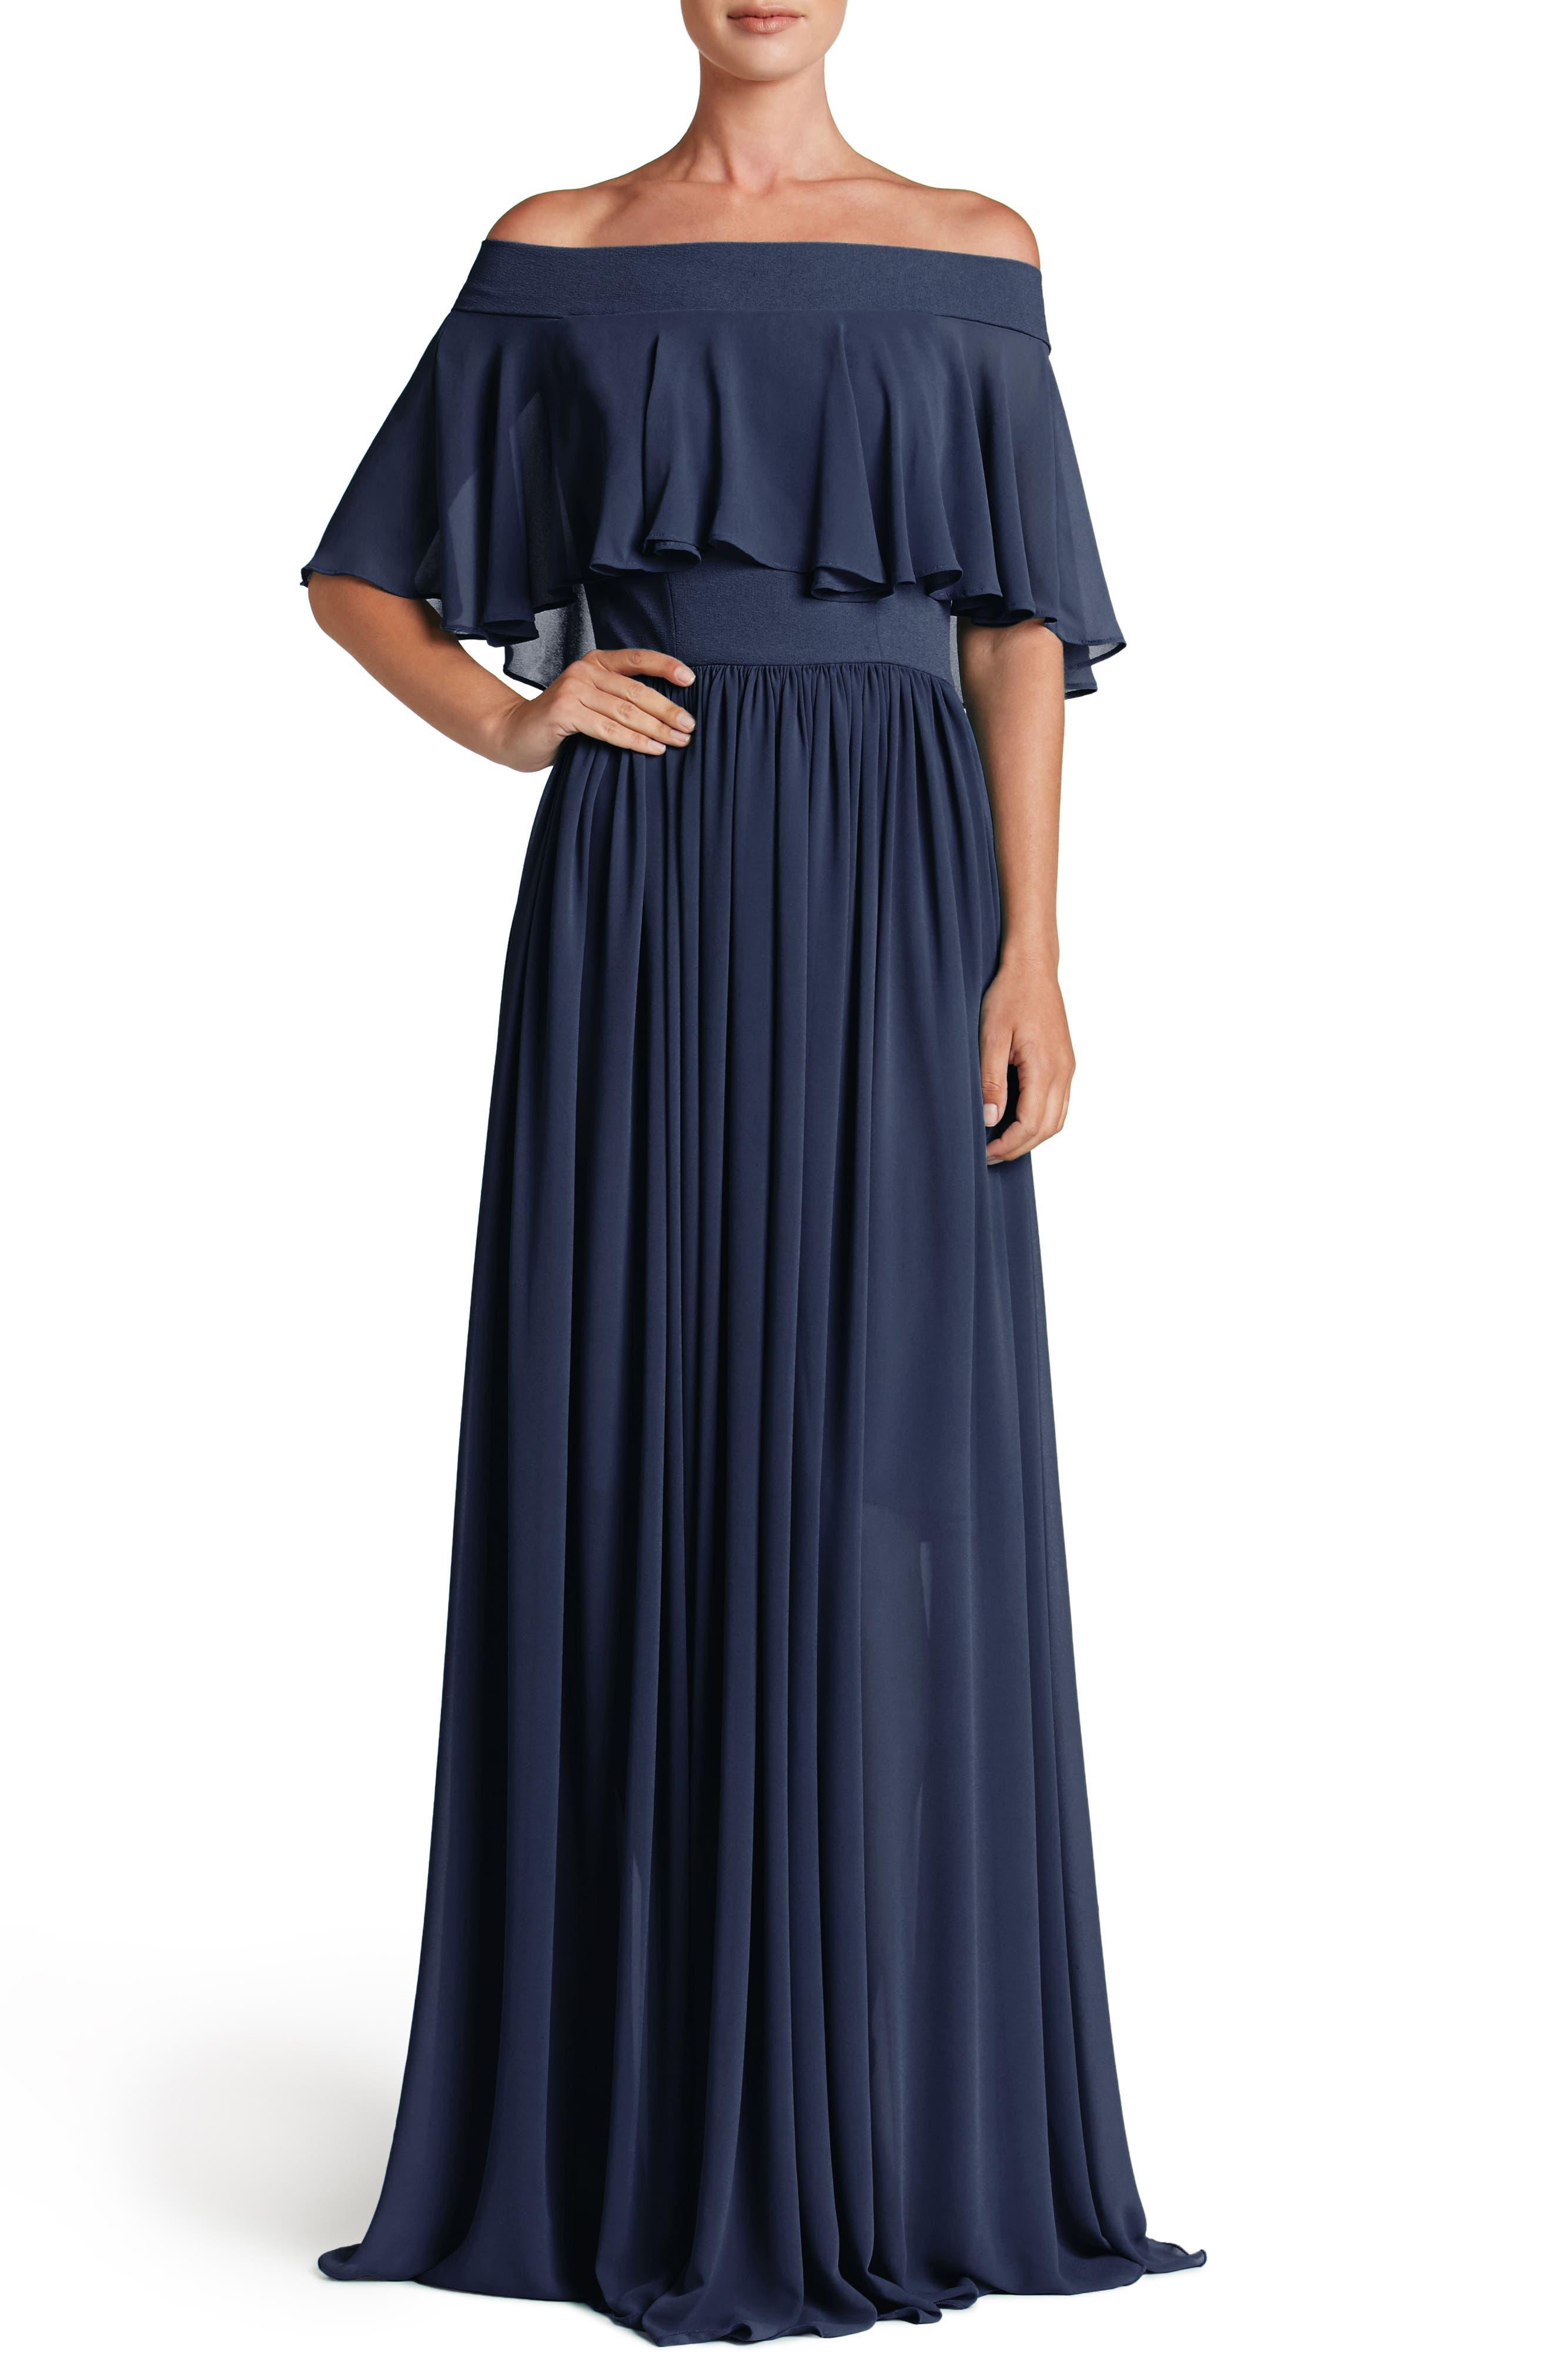 Violet Off the Shoulder Chiffon Gown,                         Main,                         color, 456